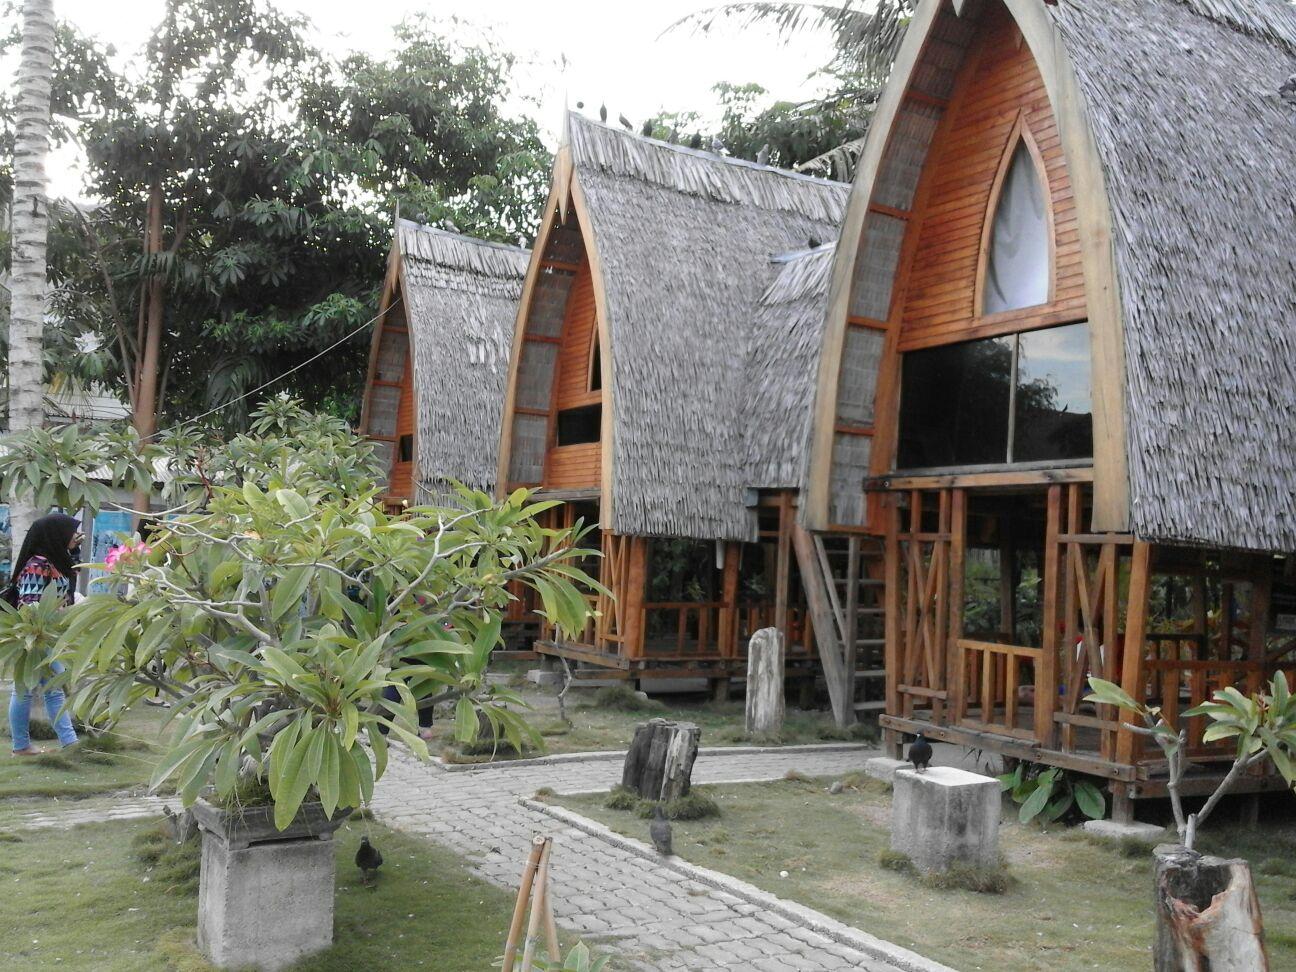 Taman Wisata Bongo Gorontalo Tawarkan Religi Img 20151115 Wa0008 Rumah